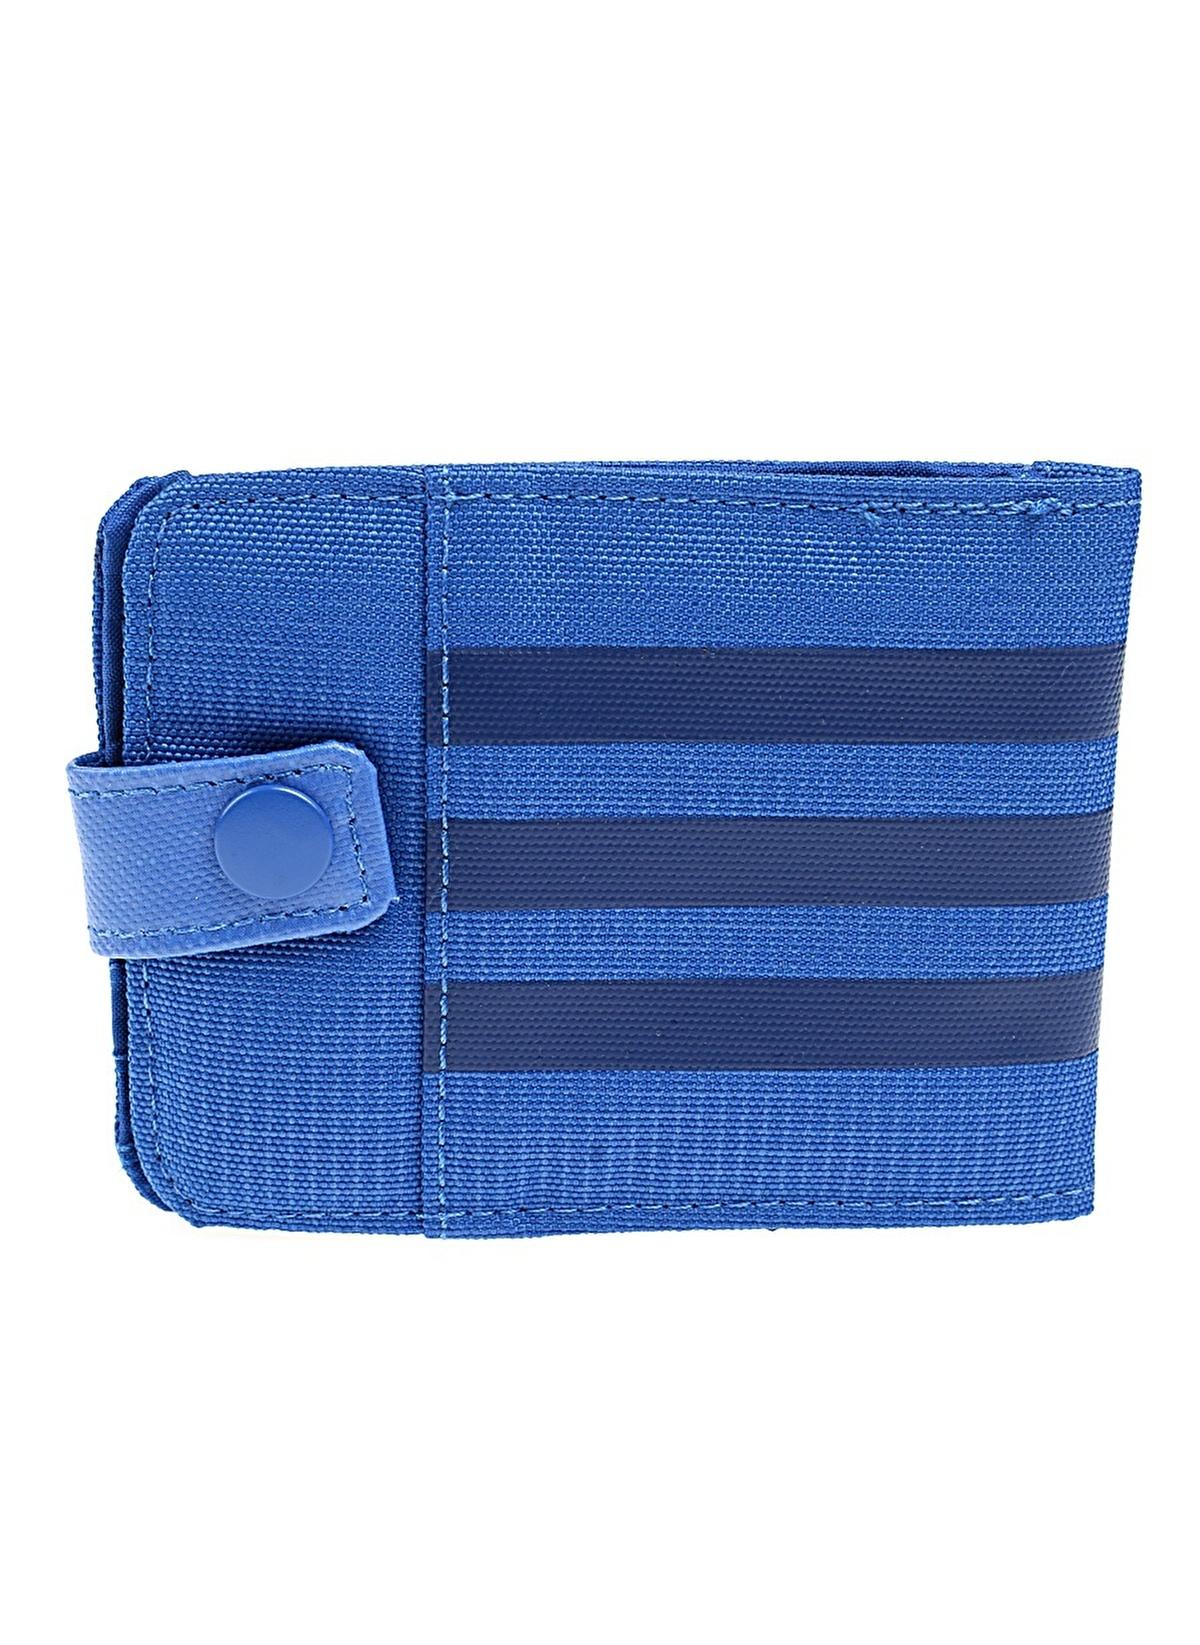 e3bf20519dc6c adidas Erkek Cüzdan Blue/Croyal/Croyal | Morhipo | 17489787